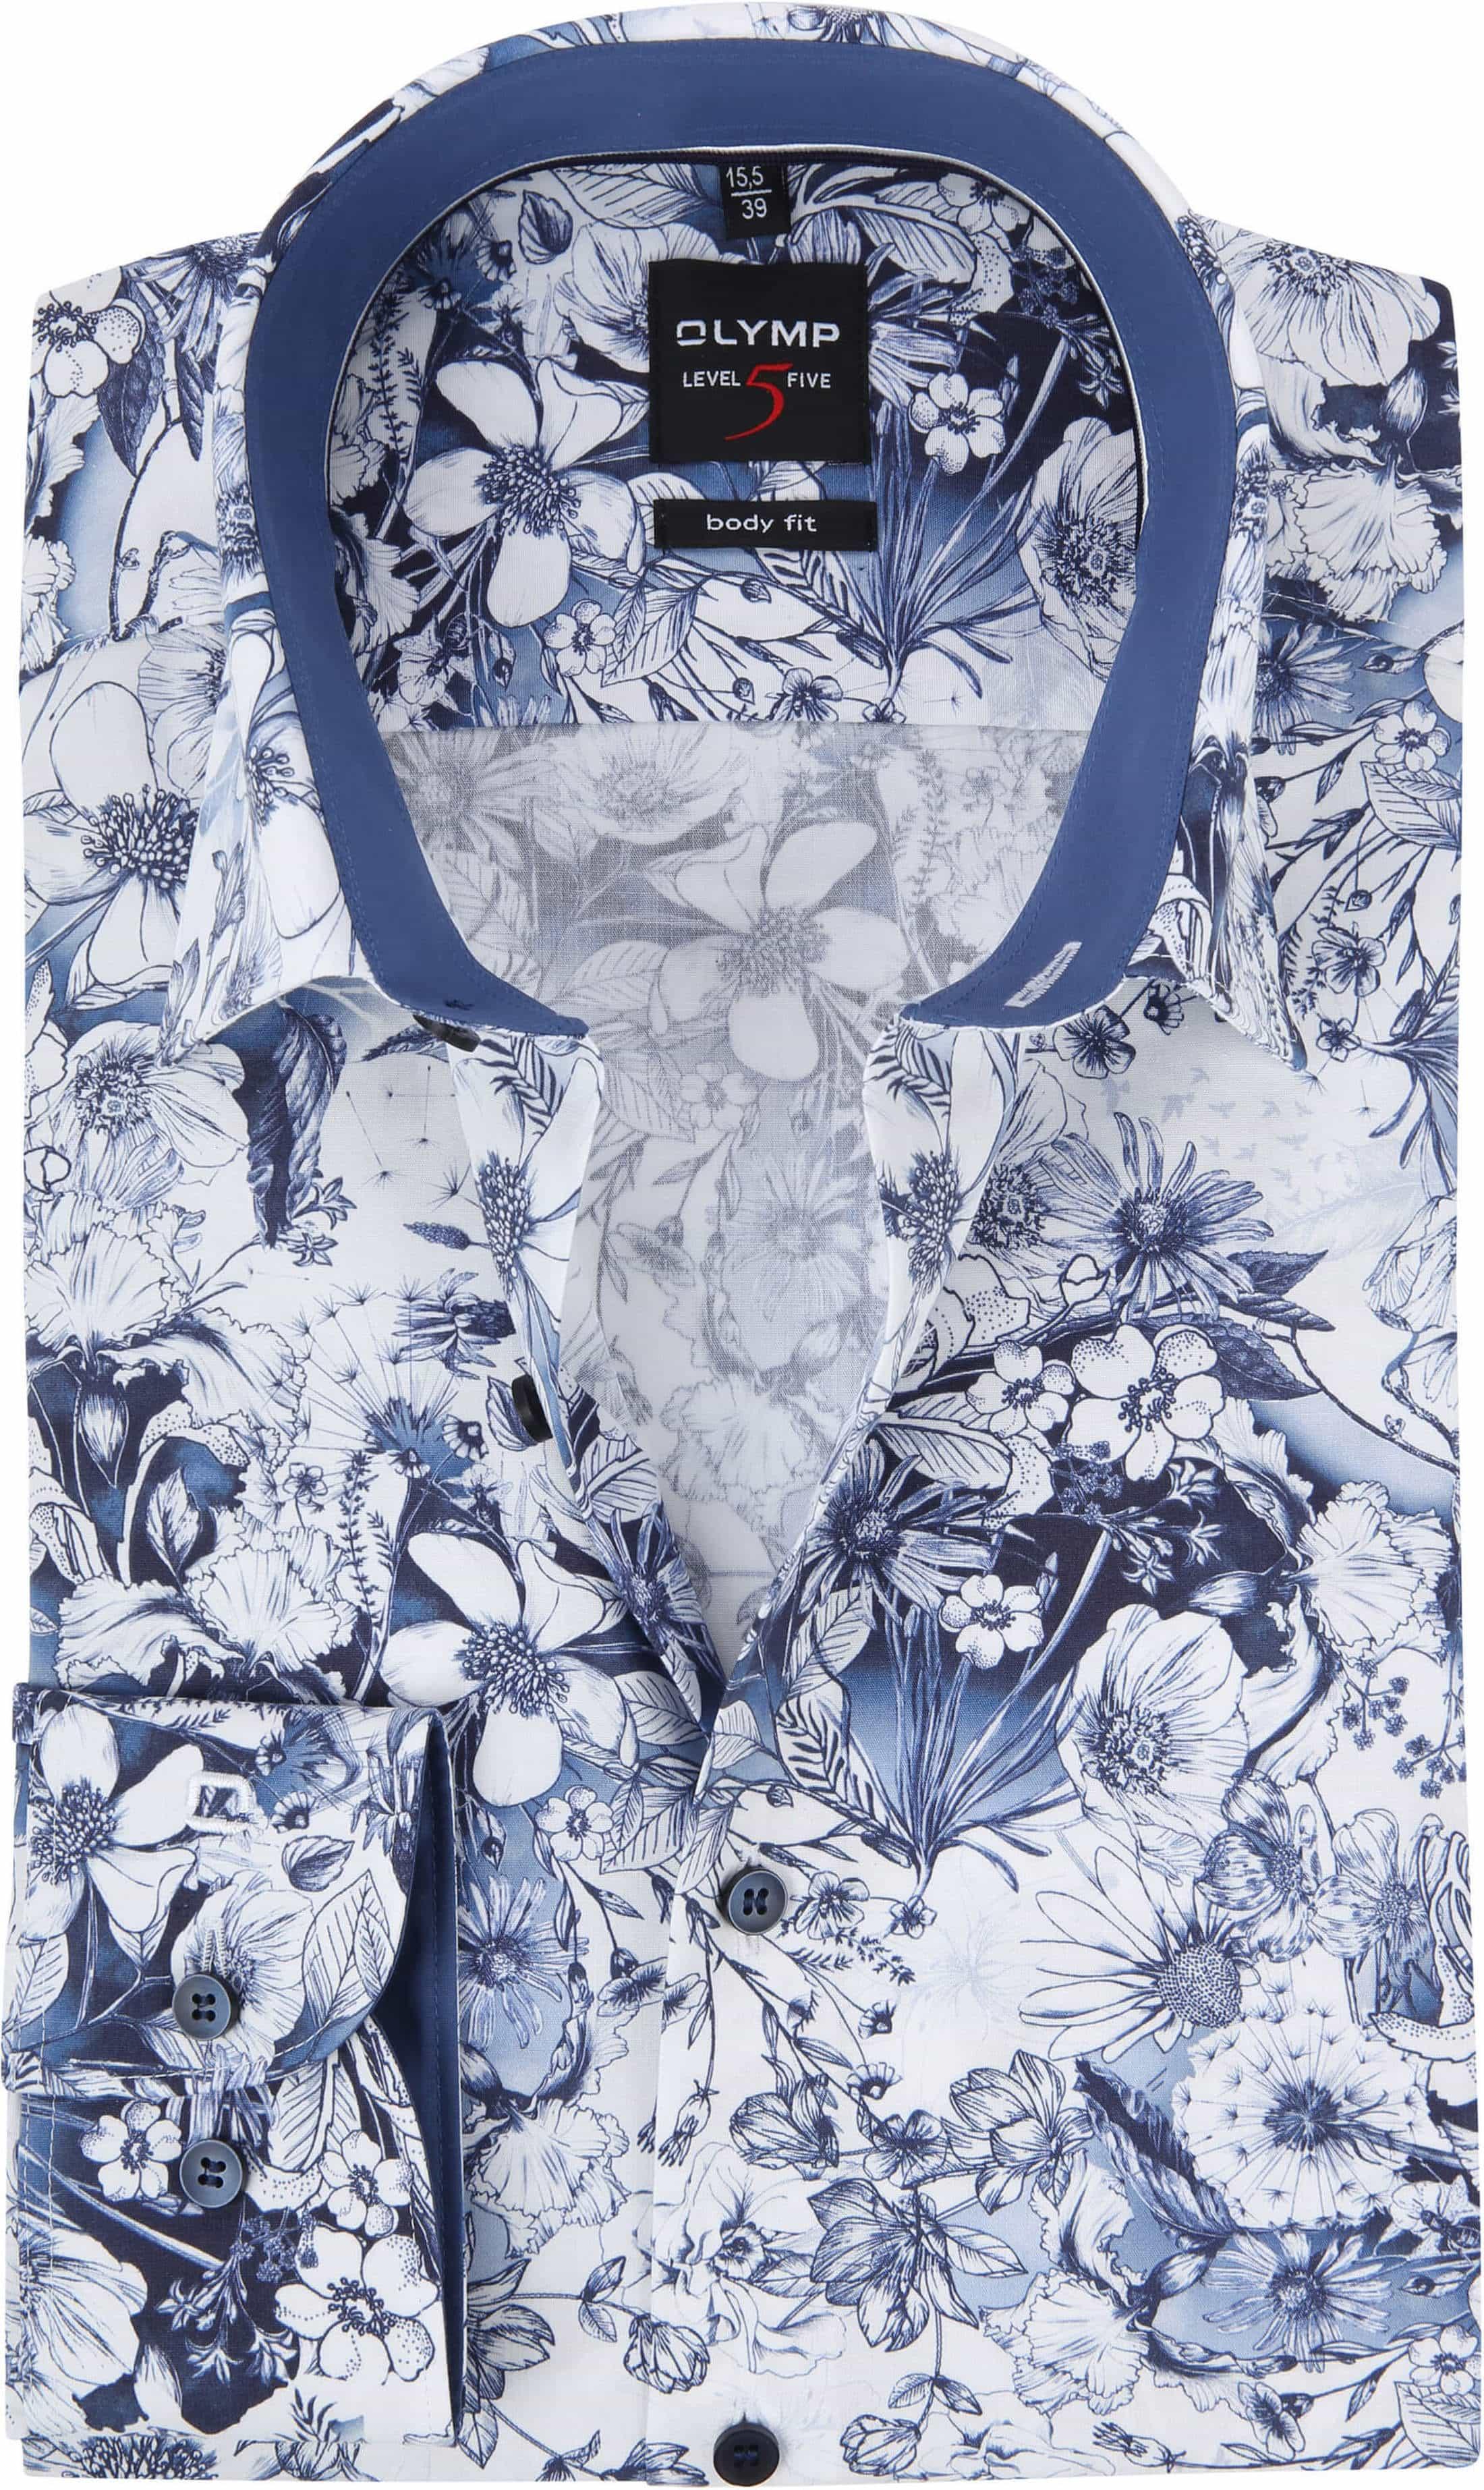 on sale 0757f d79fd OLYMP Level 5 Hemd Blau Blumen 204434 online kaufen | Suitable